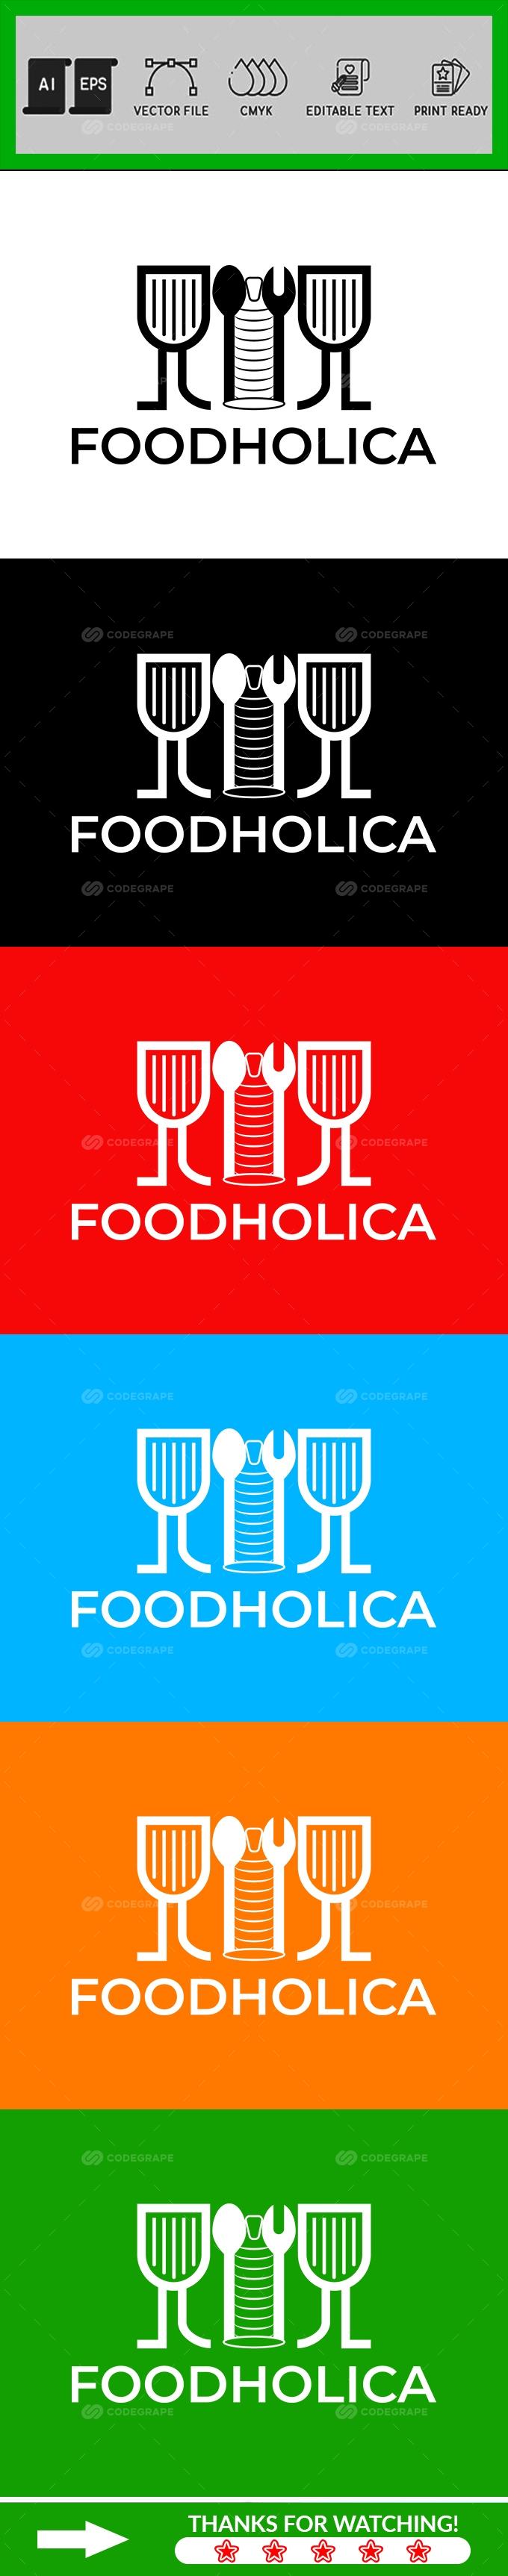 Minimalist Restaurant Logo Design Template